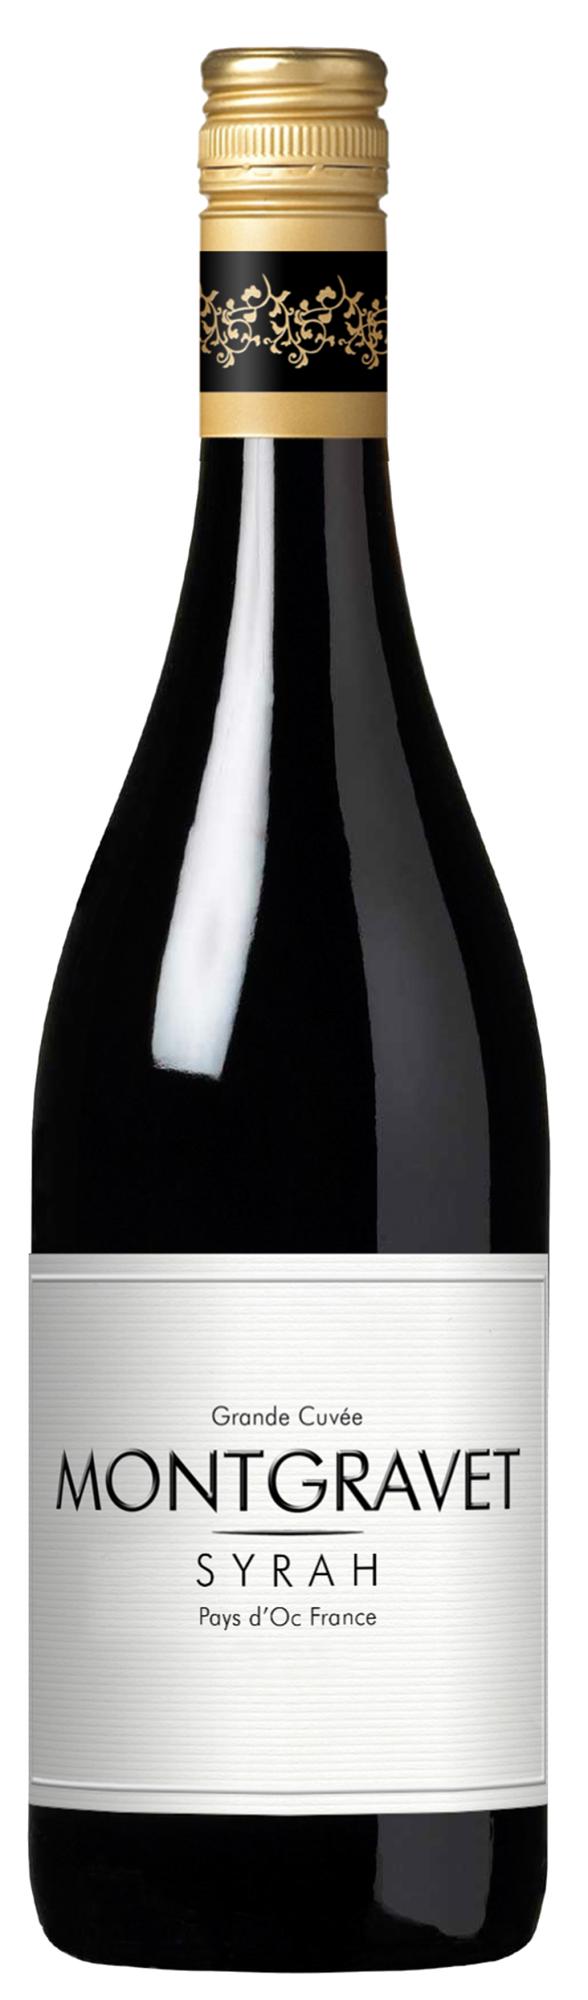 Montgravet Grande cuvée syrah